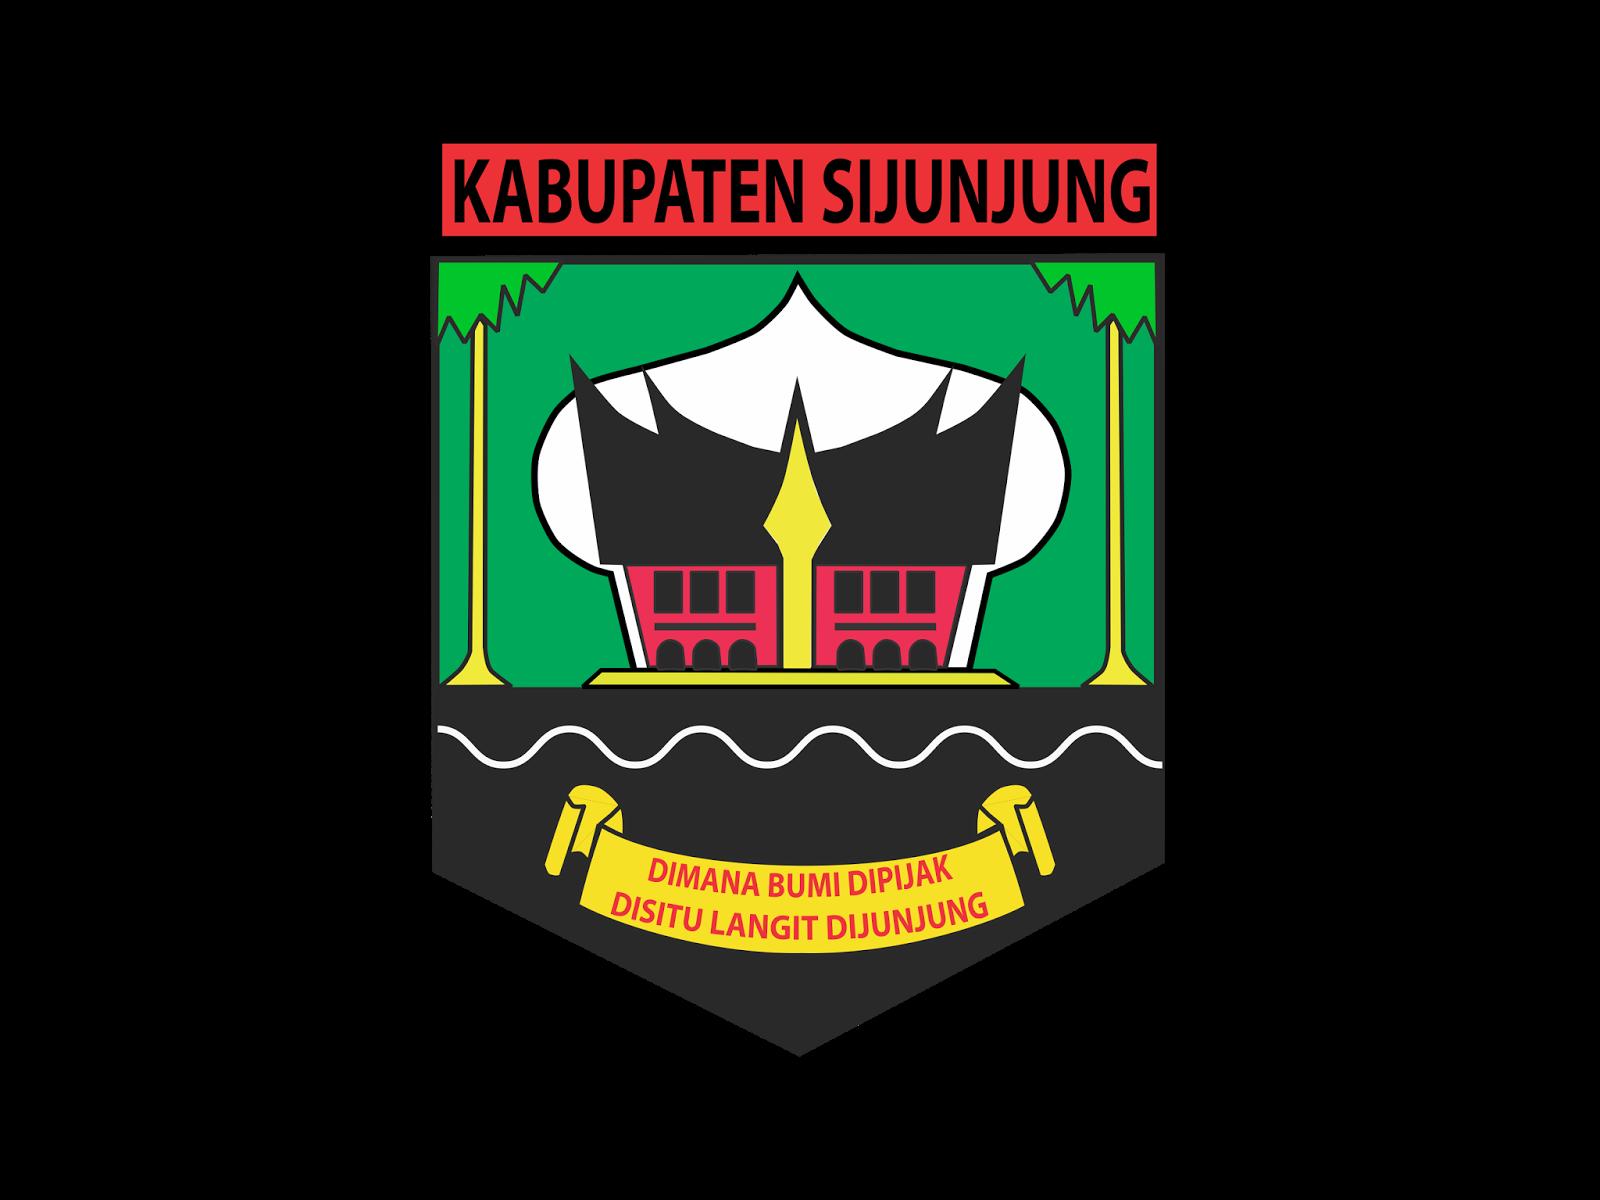 Logo Kabupaten Sijunjung Vector Cdr Png Hd Biologizone